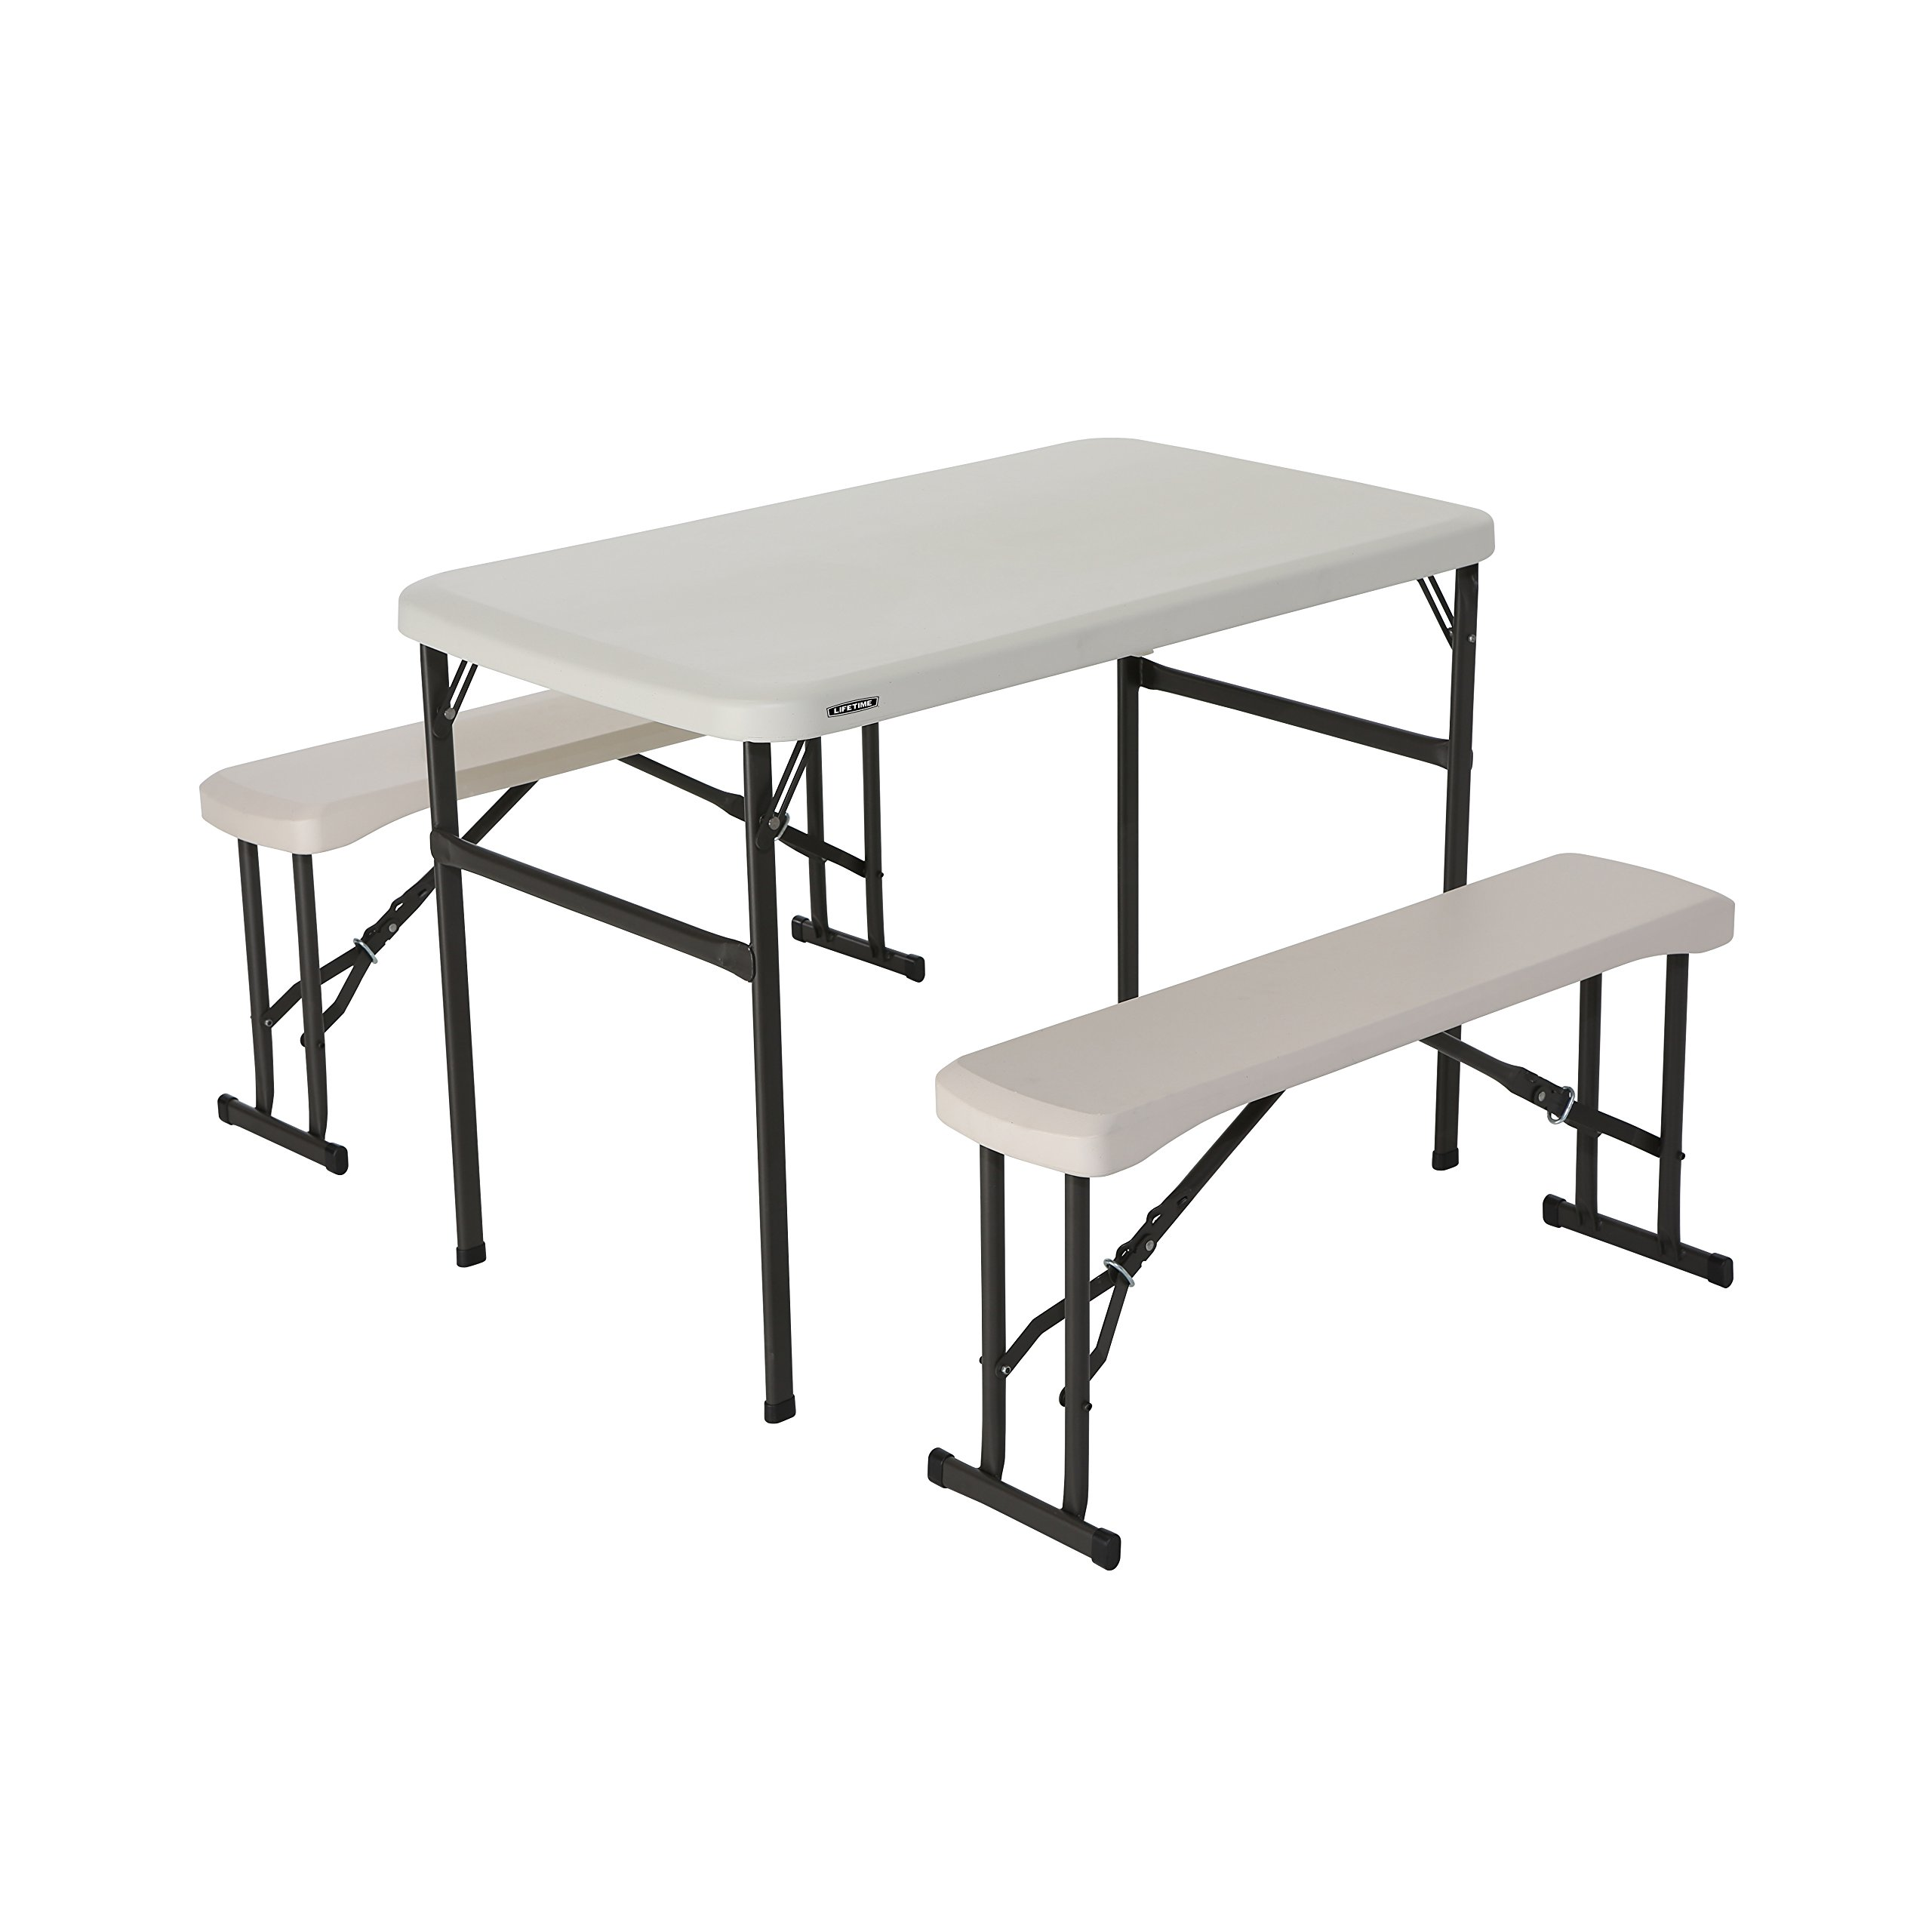 Lifetime 80373 Portable Folding Camping Picnic Table Bench Set, Almond